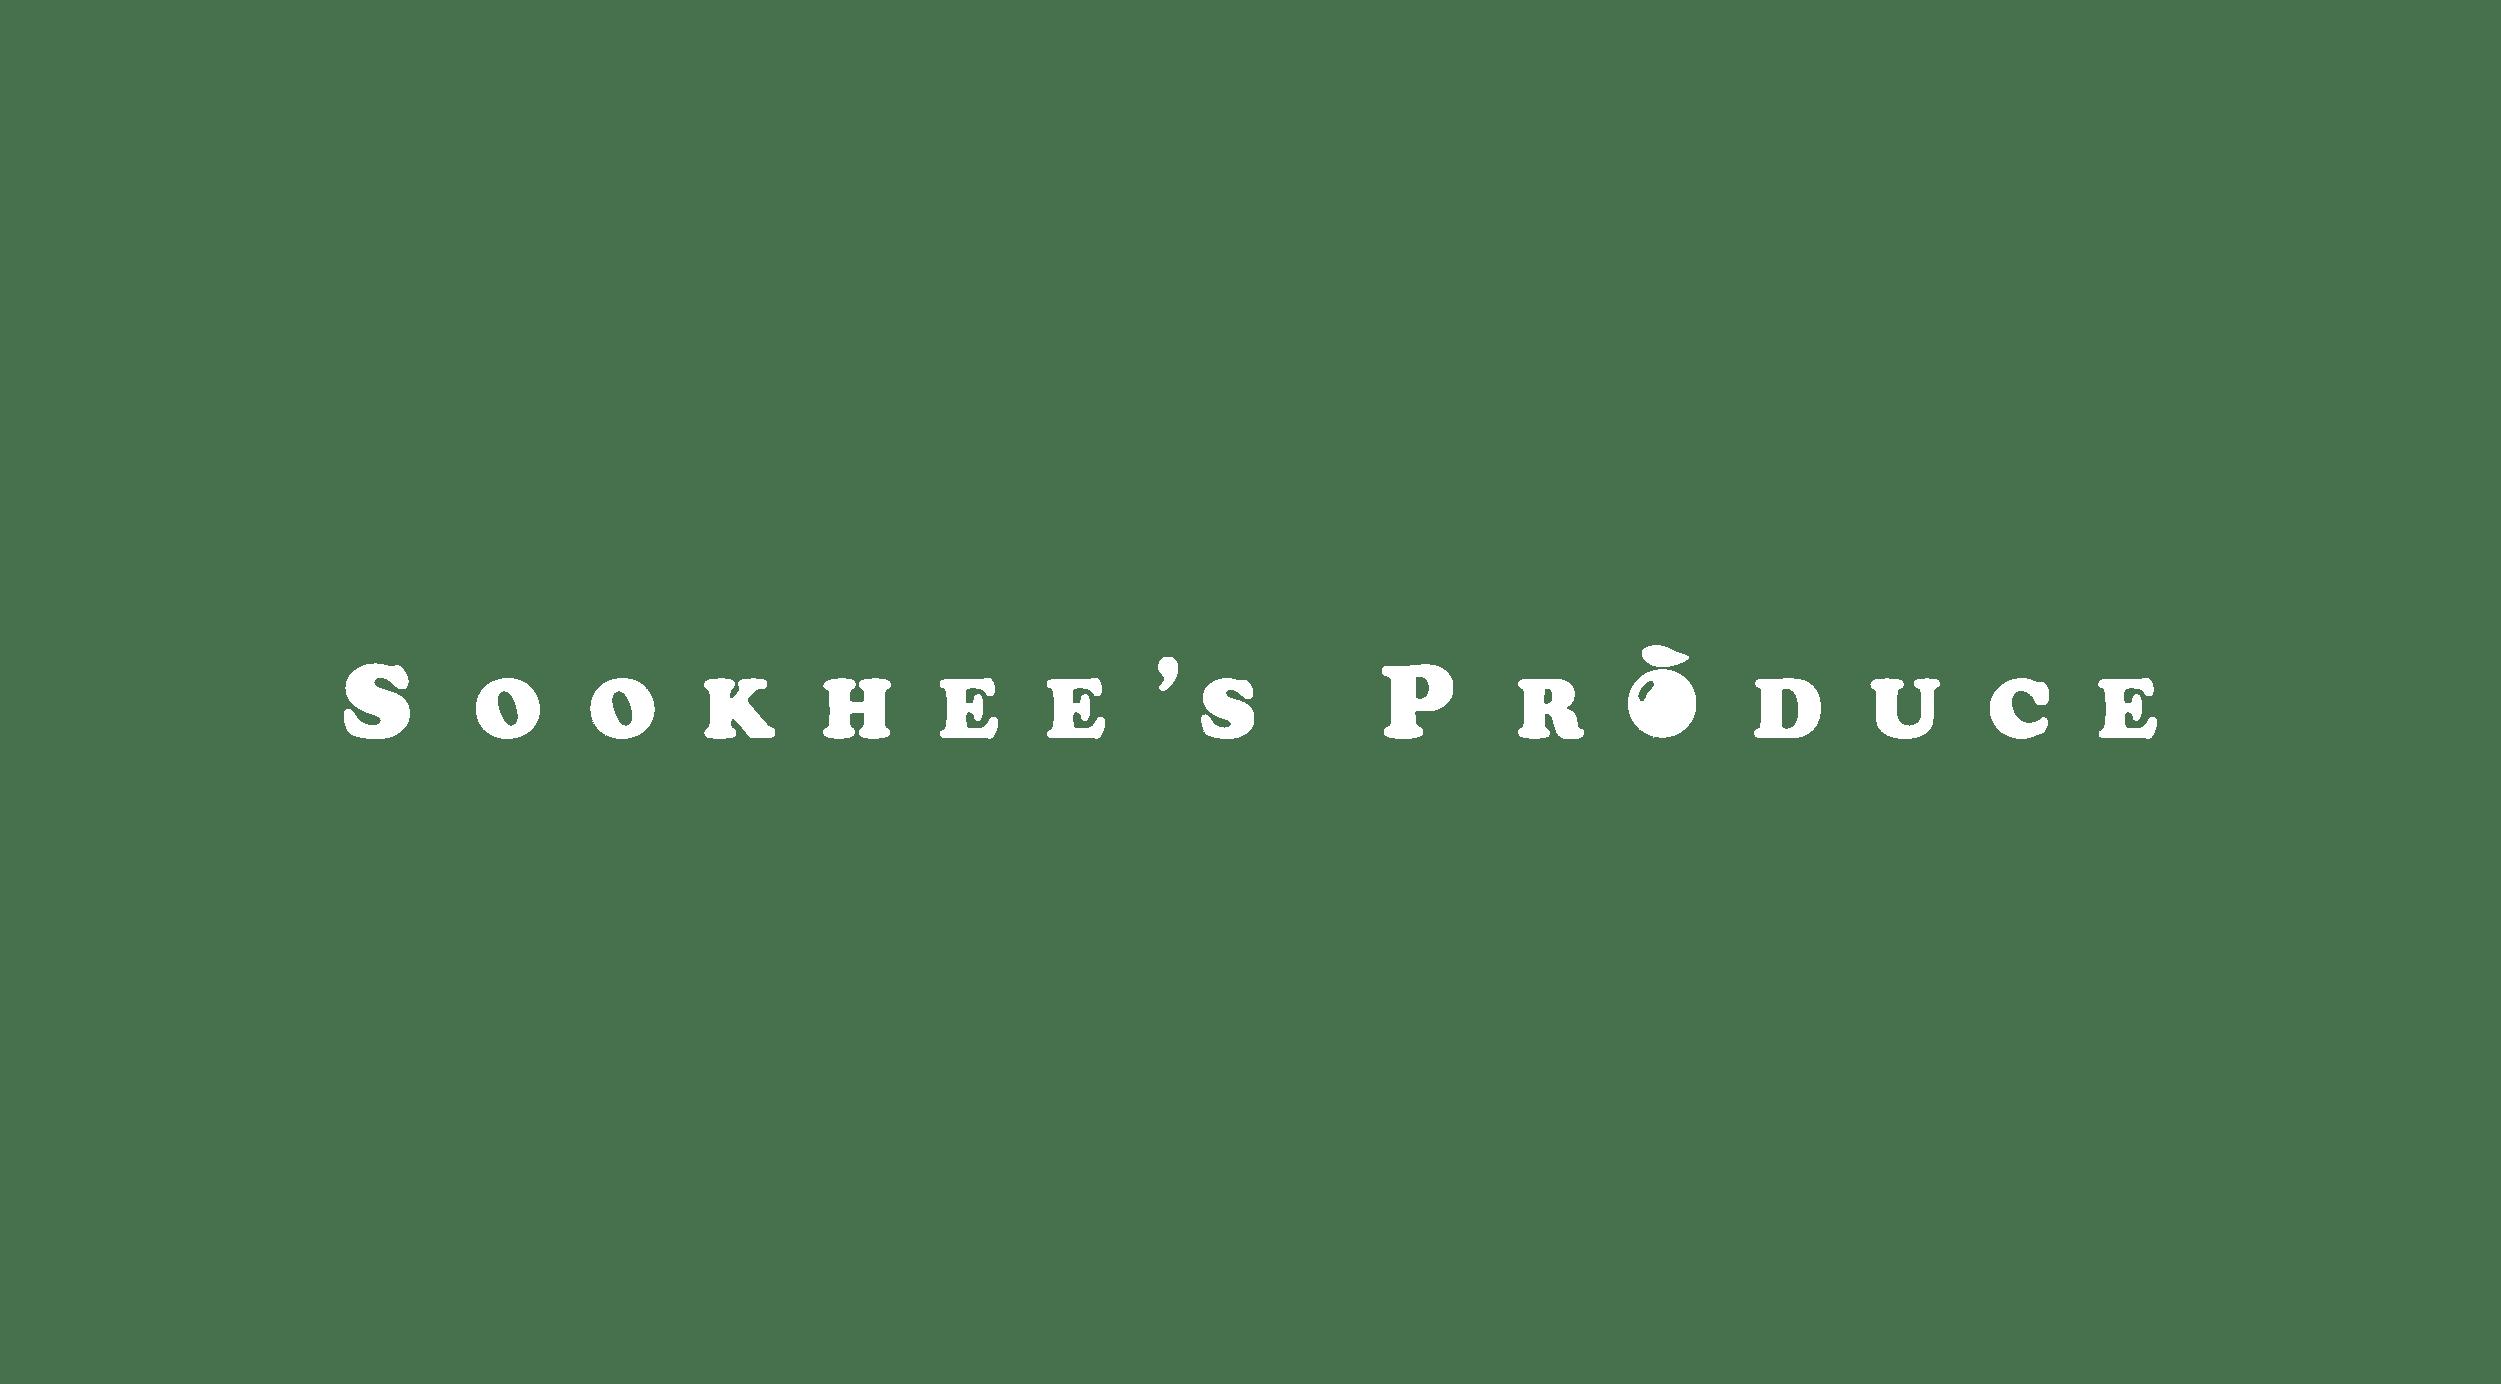 SookheesProduce